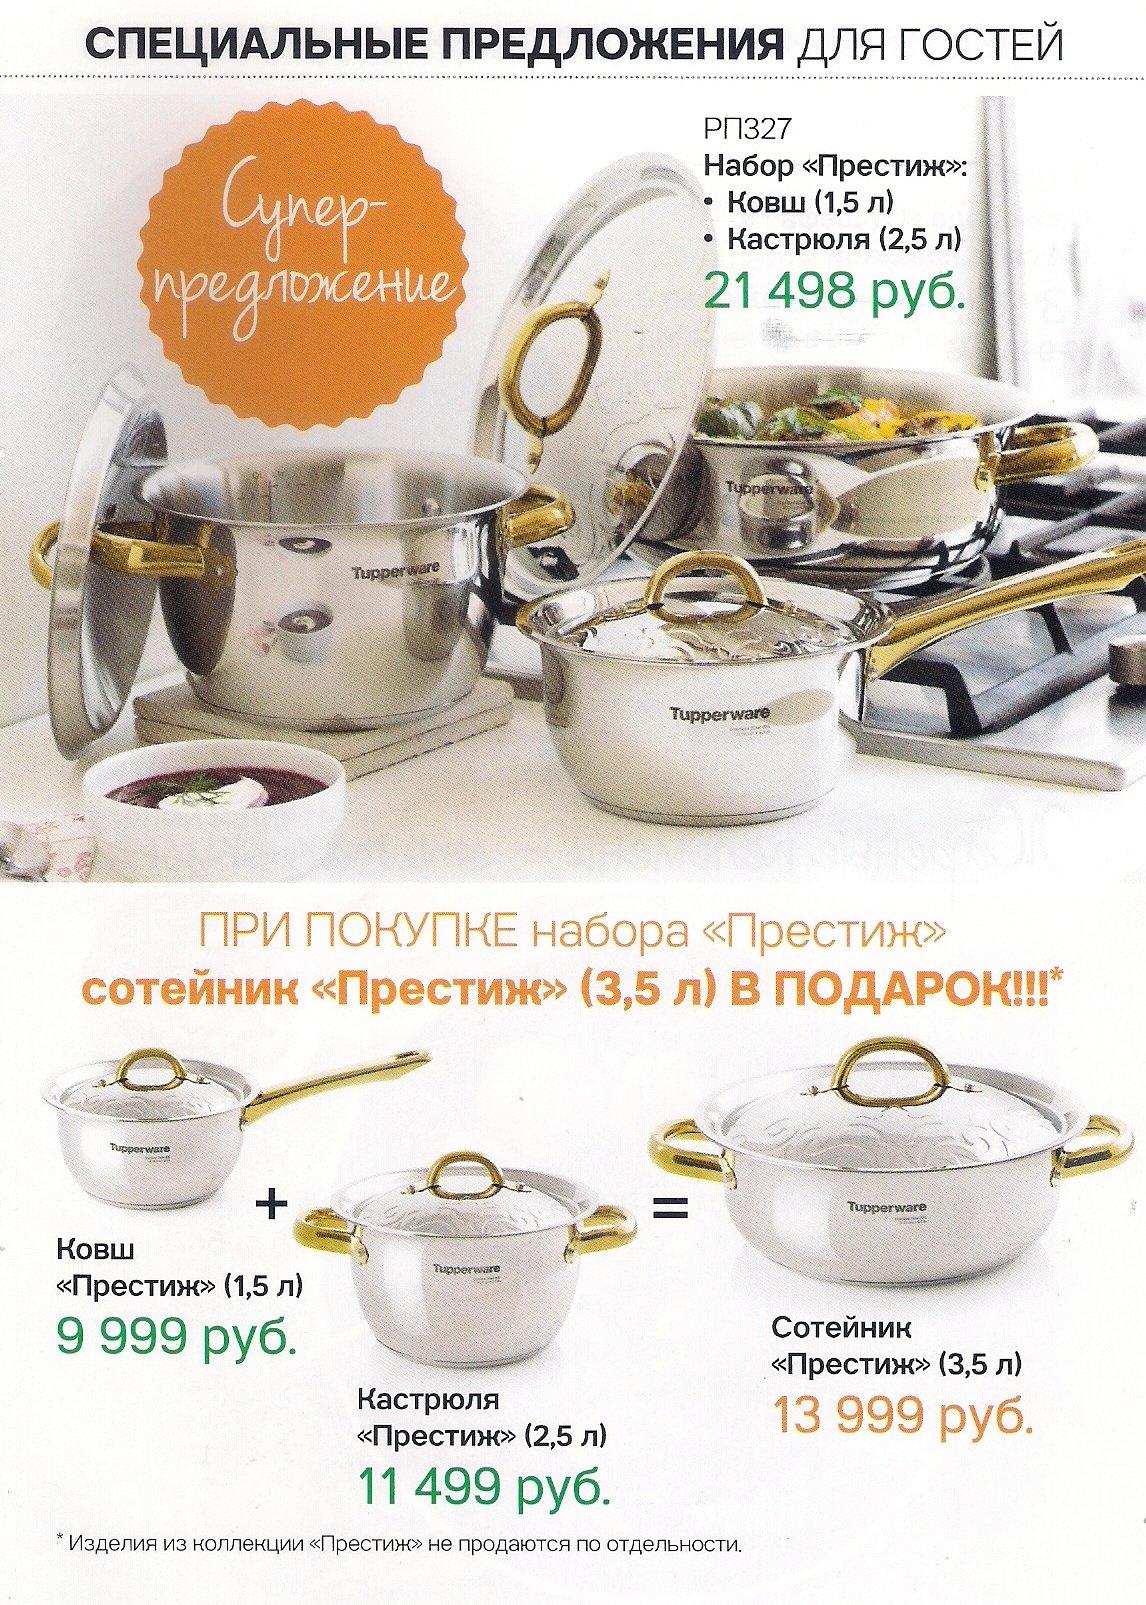 http://tupperware-online.ru/images/upload/20d.jpg